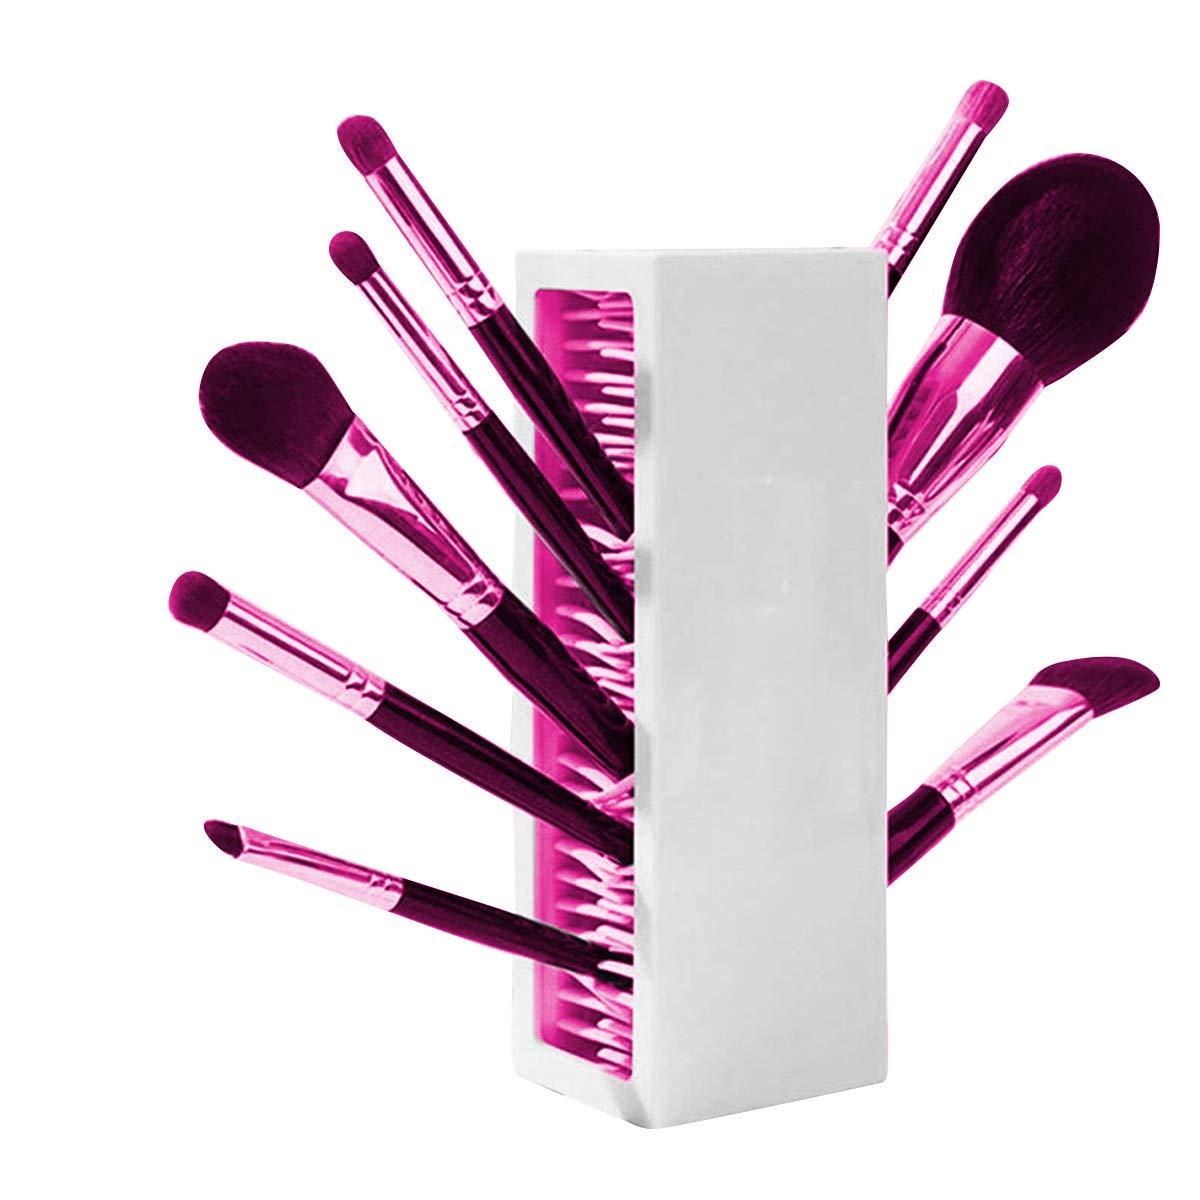 DaMohony Makeup Brush Holder, Countertop Silicone Cosmetics Brushes Drying Rack Air Storage Organizer